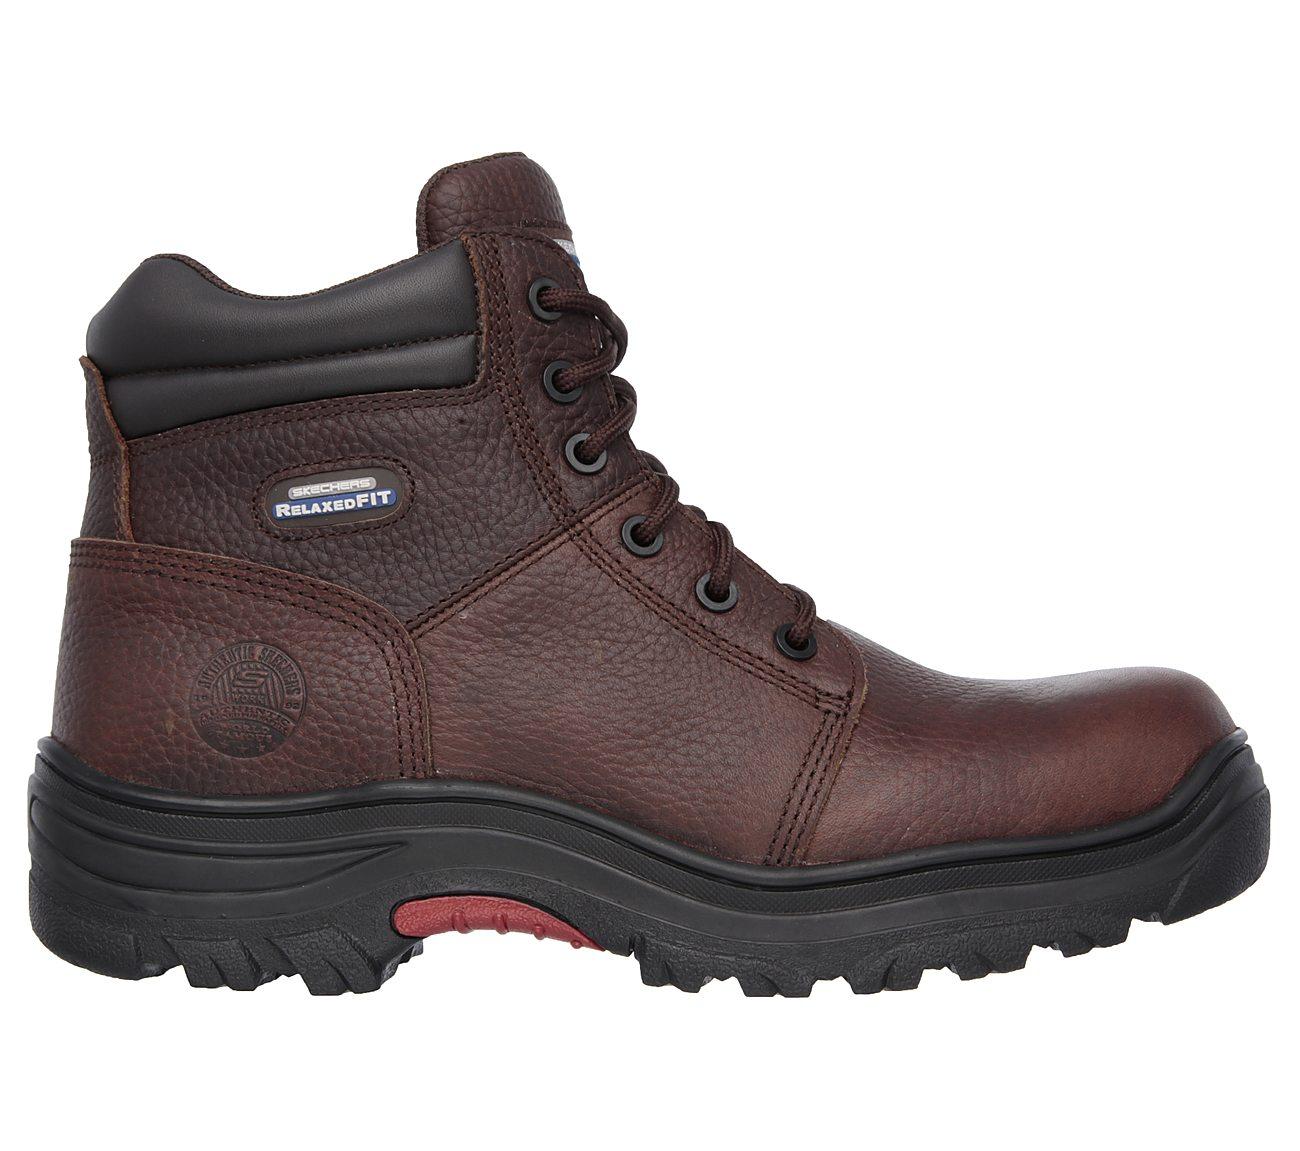 Mens Skechers Burgin Composite Toe Relaxed Fit Memory Foam Work Boot Dark Brown